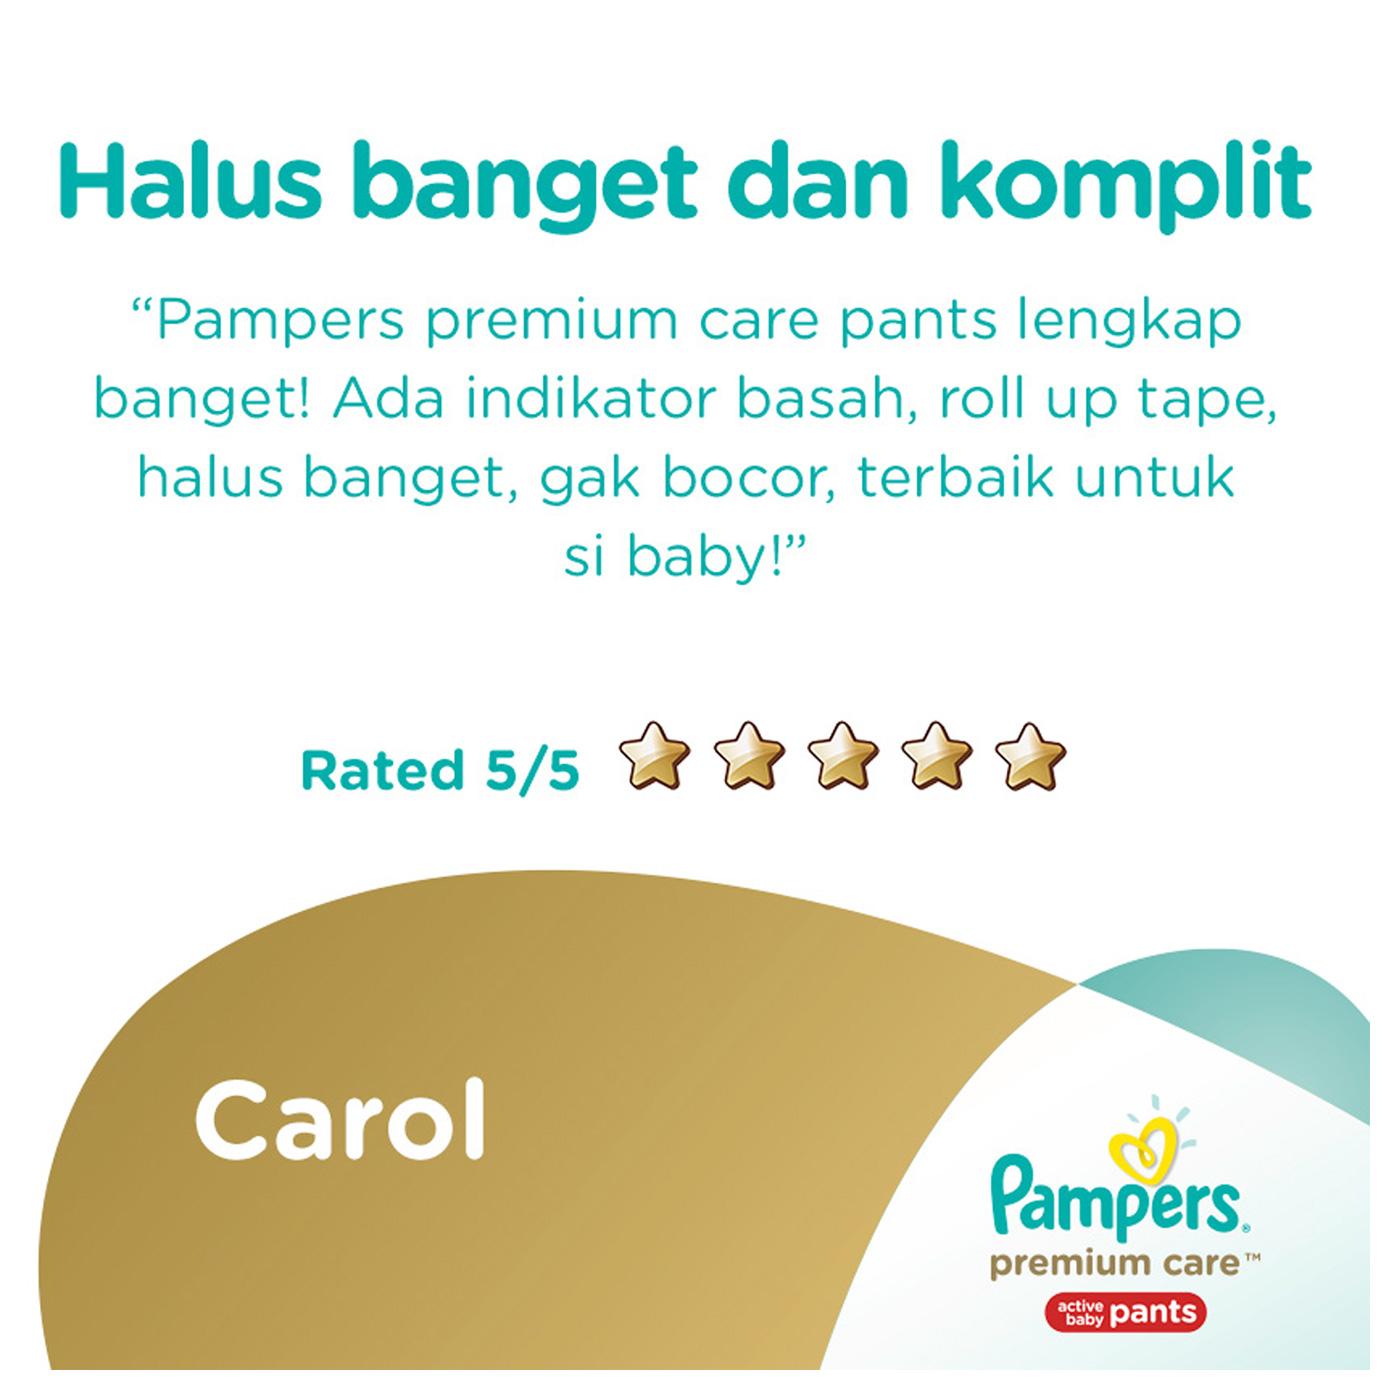 Pampers Popok Celana XL-36 Premium Care 7